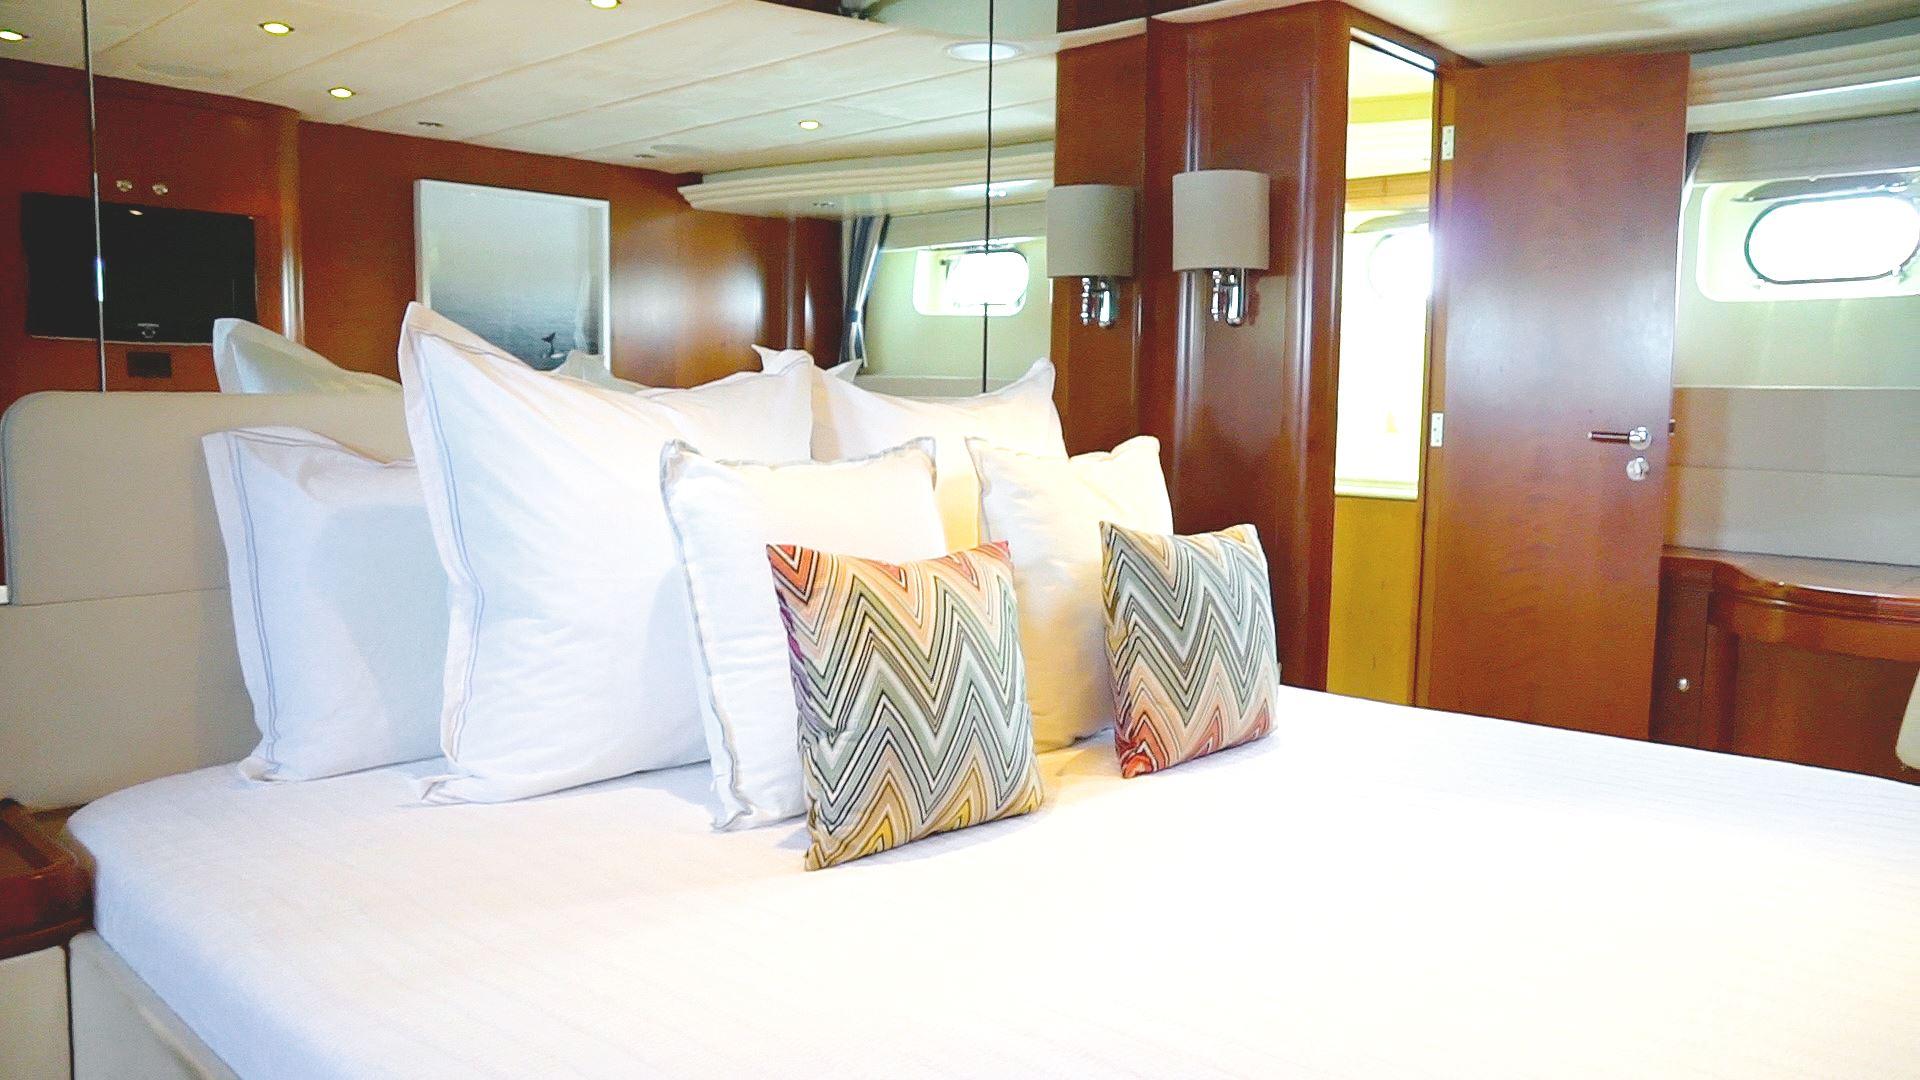 Clean guest cabin decor